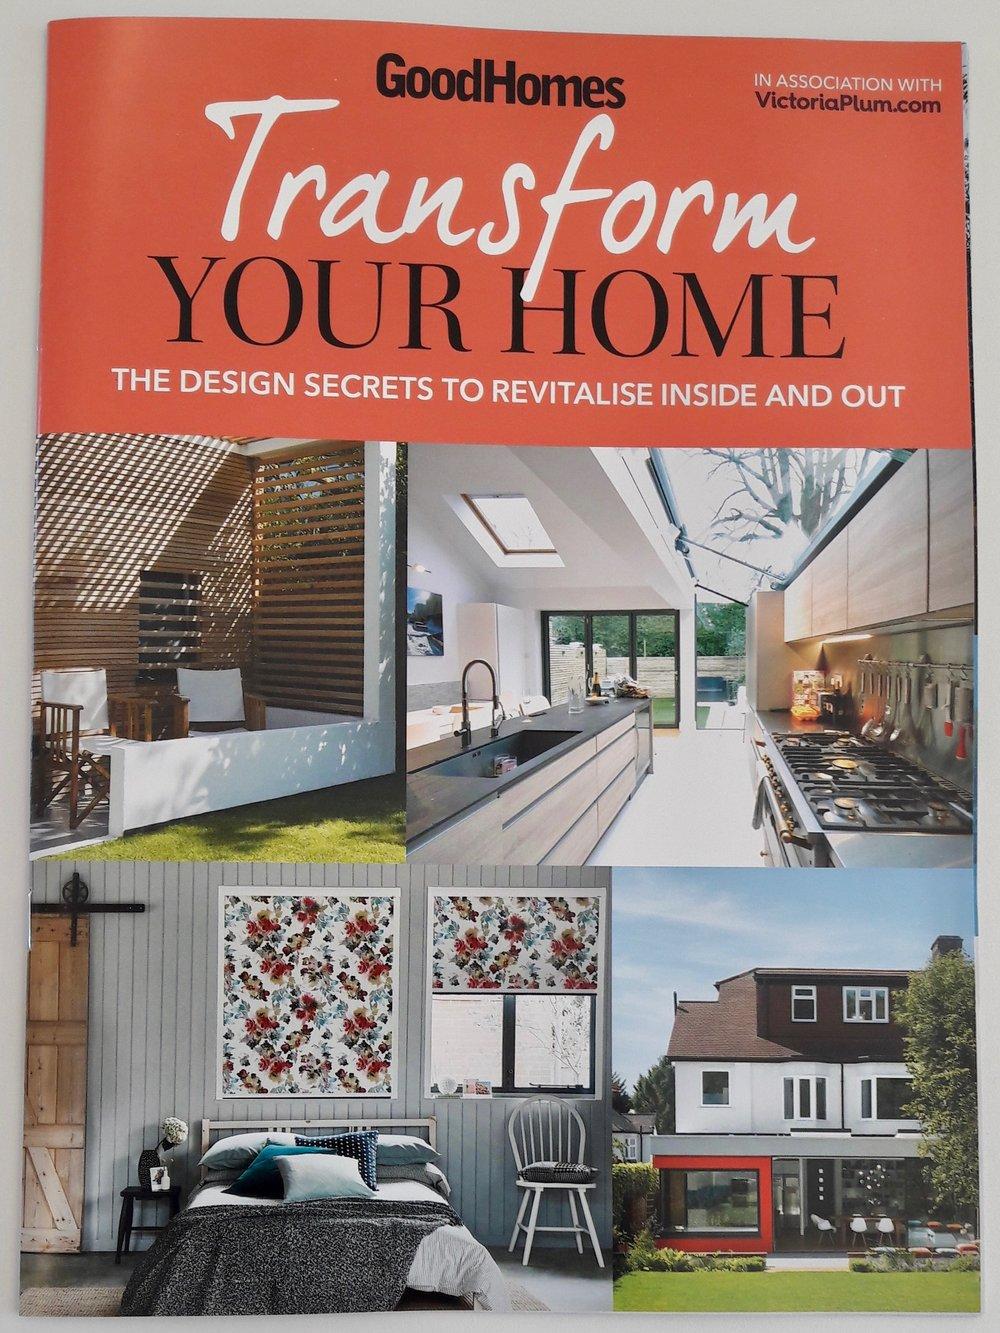 18 11_Good Homes_Transform Your Home